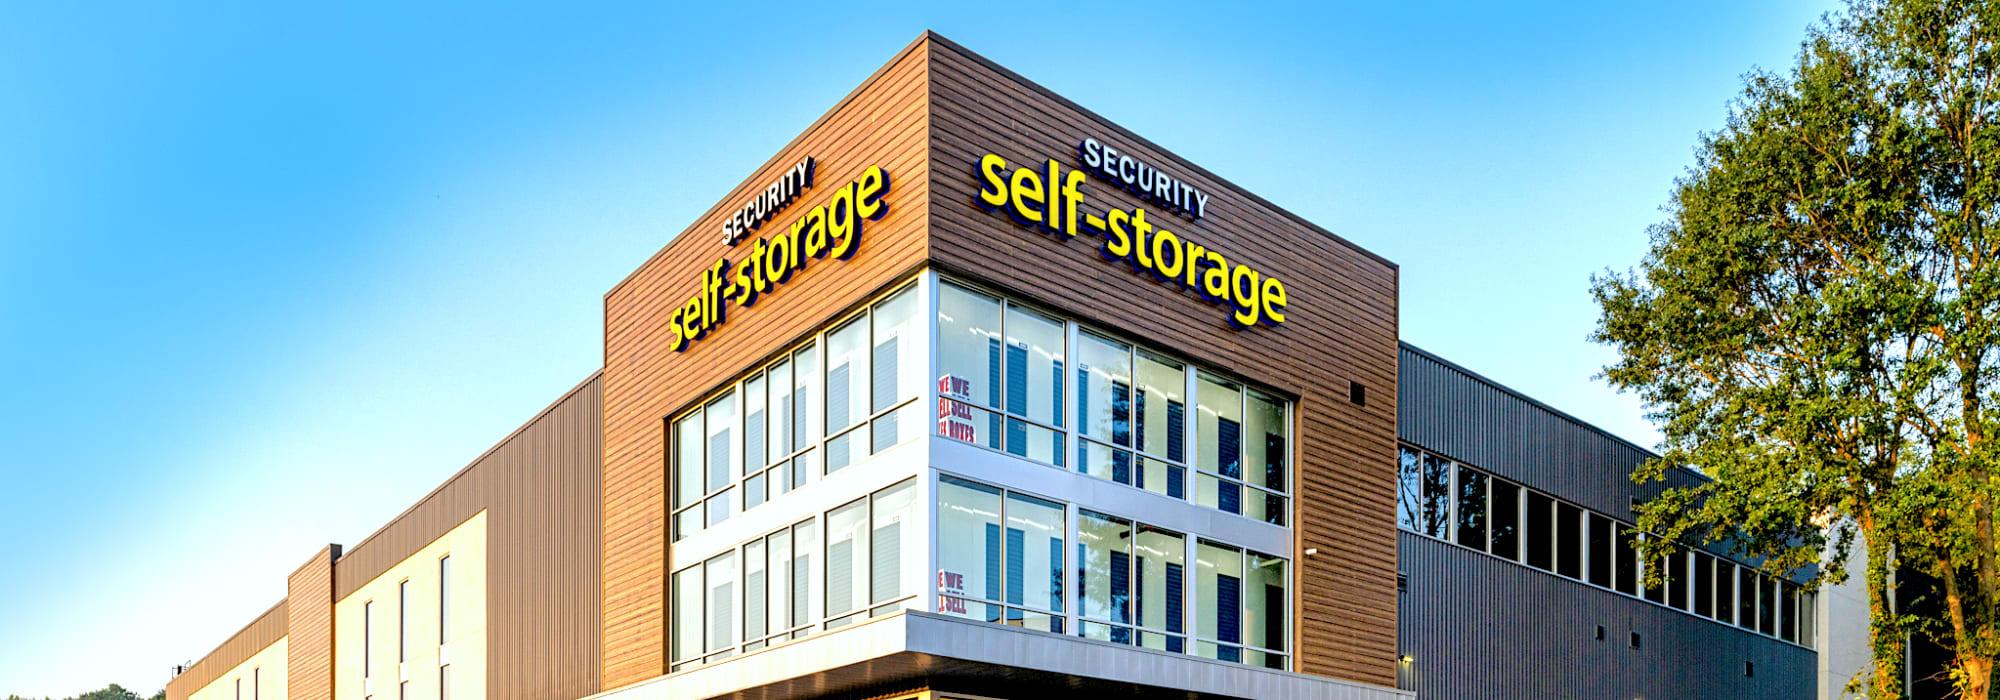 Security Self-Storage in Atlanta, Georgia